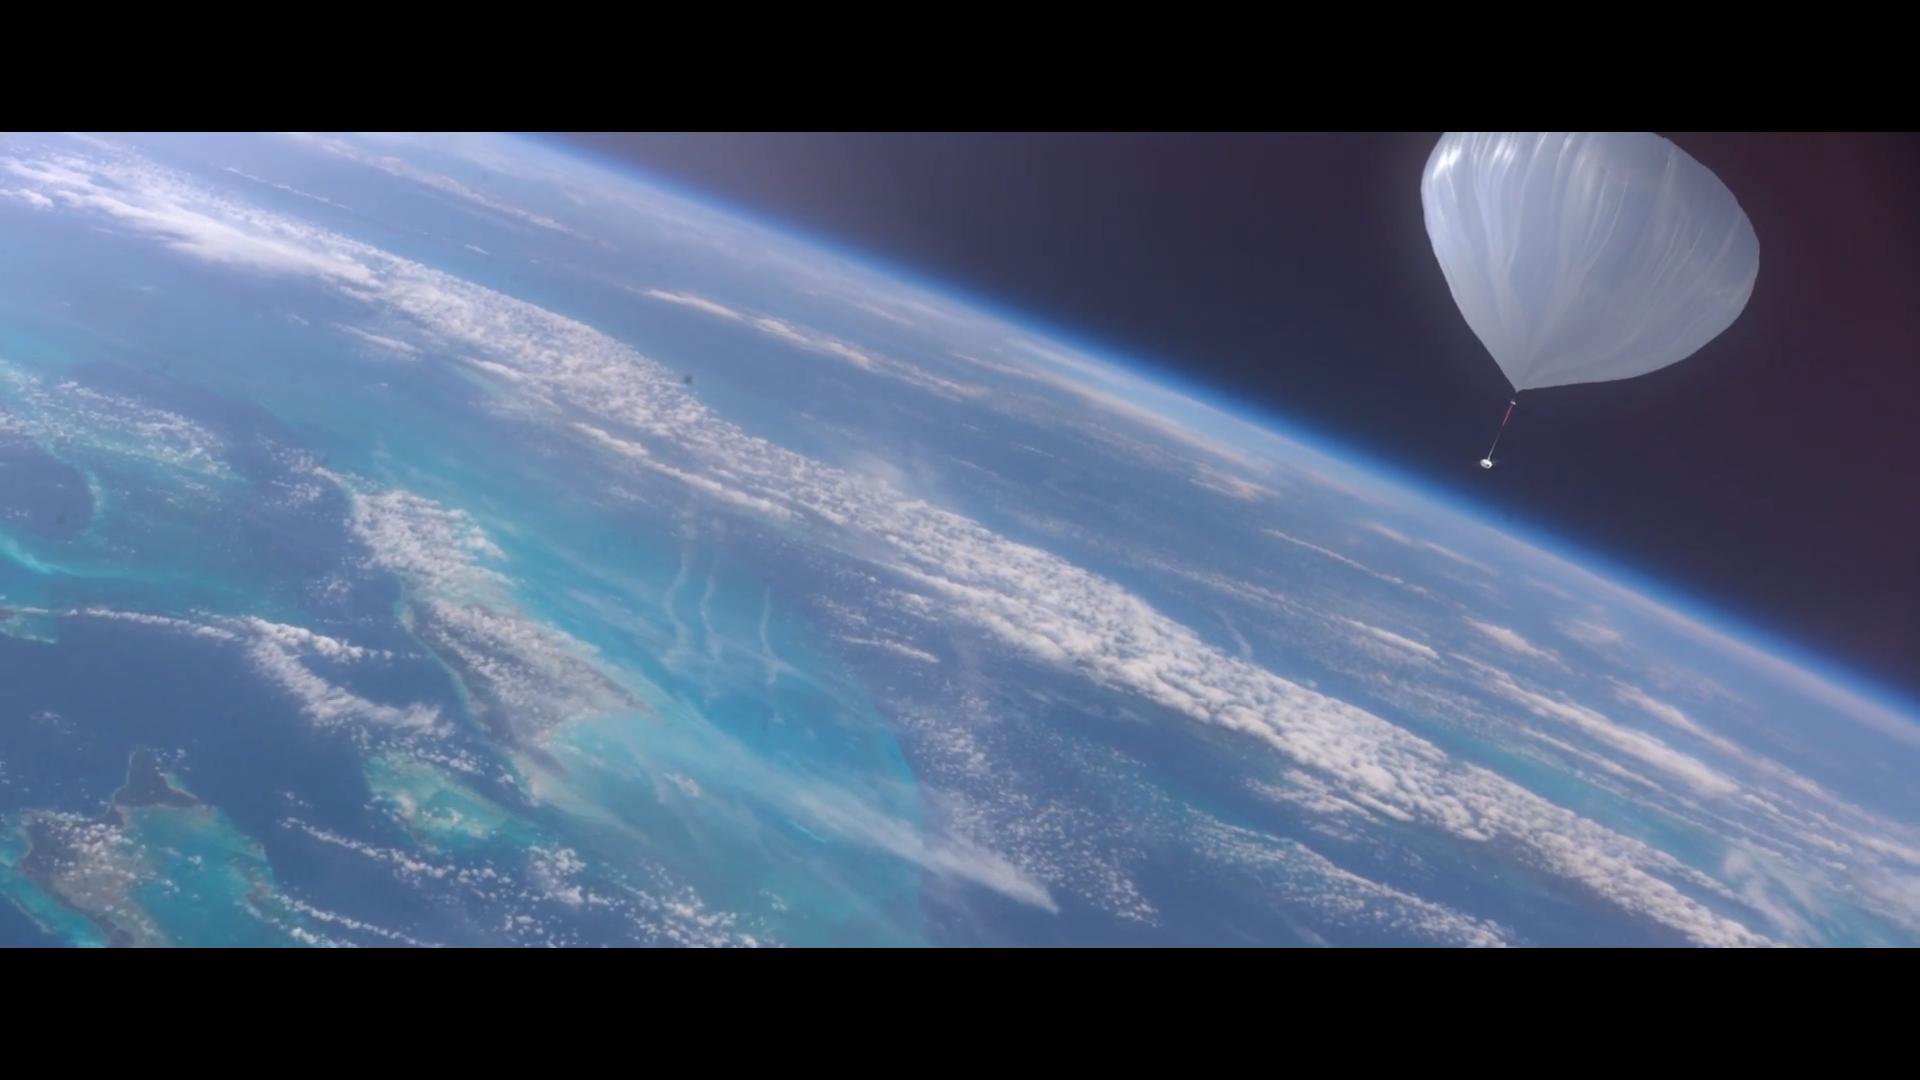 Капсула Bloon на фоне кривизны земной поверхности